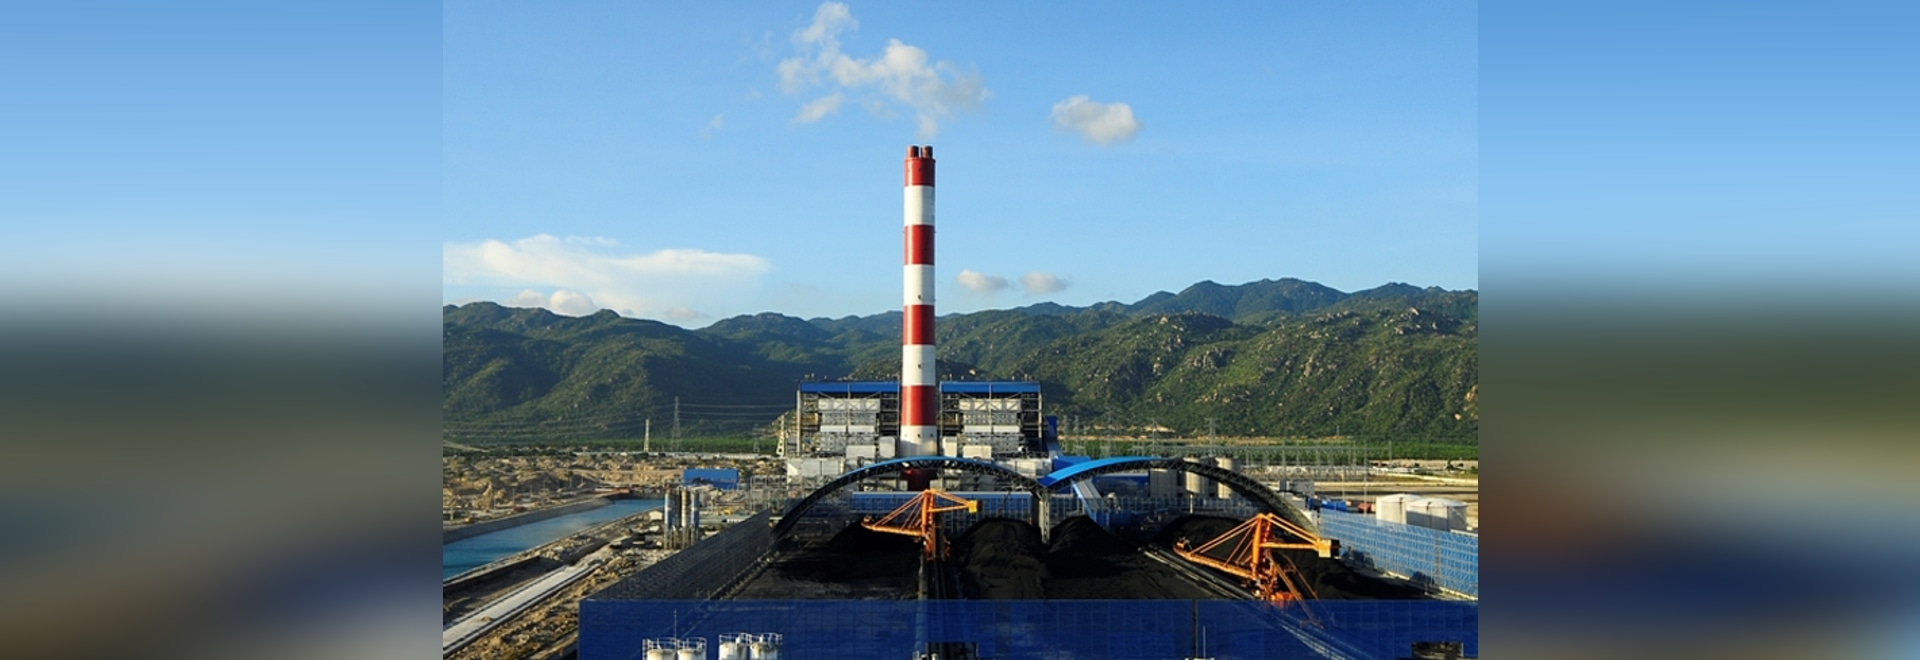 Progetto del BOT del Vietnam Vinh Tan Power Plant